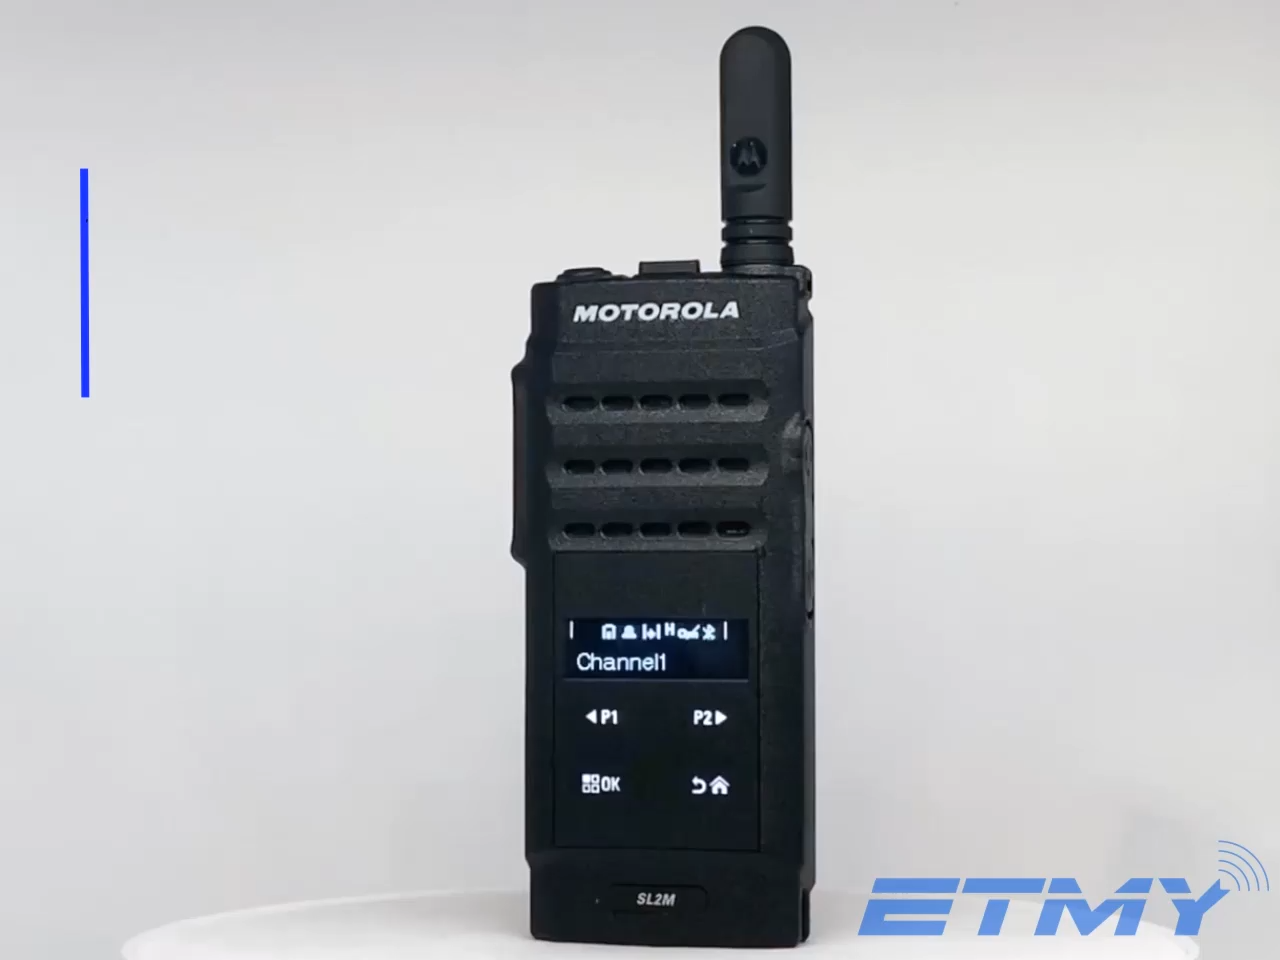 स्लिम मोटोरोला मिनी MOTOTRBO पोर्टेबल 136-174 MHz 403-470 MHz SL2M/SL500e वॉकी टॉकी